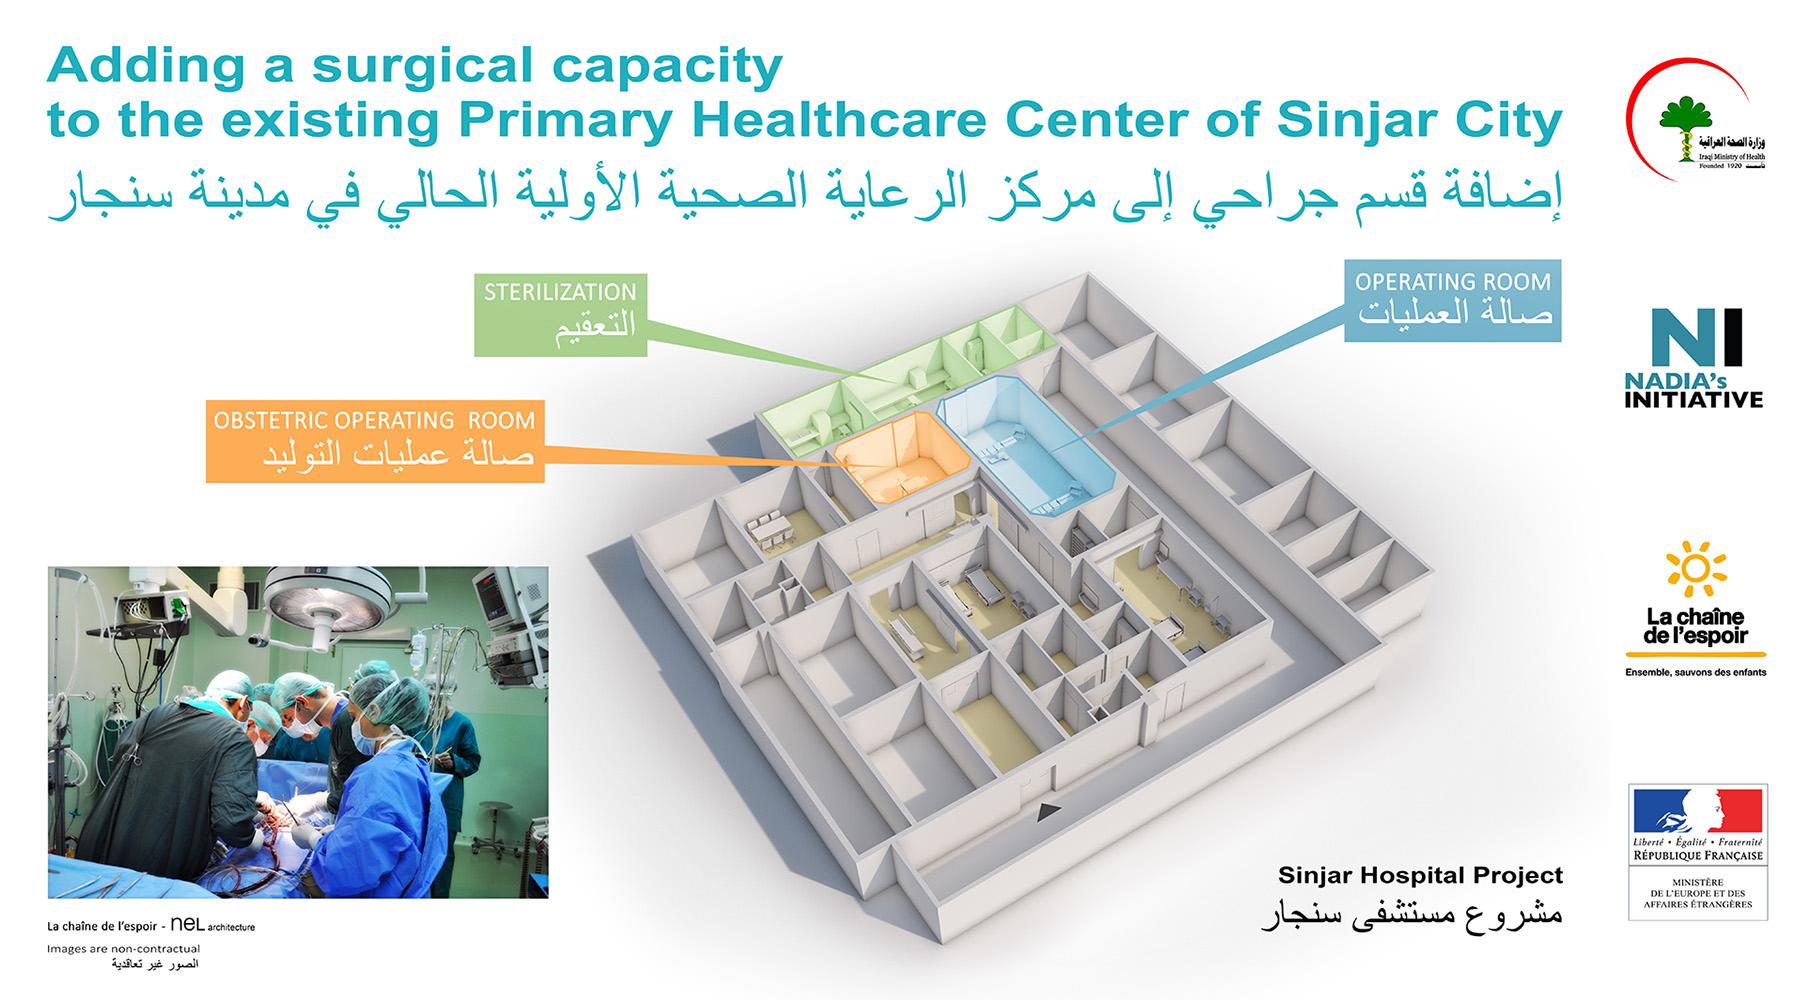 003_Nouvel-hopital-de-Sinjar-Irak-Nel-architecture-Marianoel-Garcia-architecte-PANNEAU-MEDICAL-1000